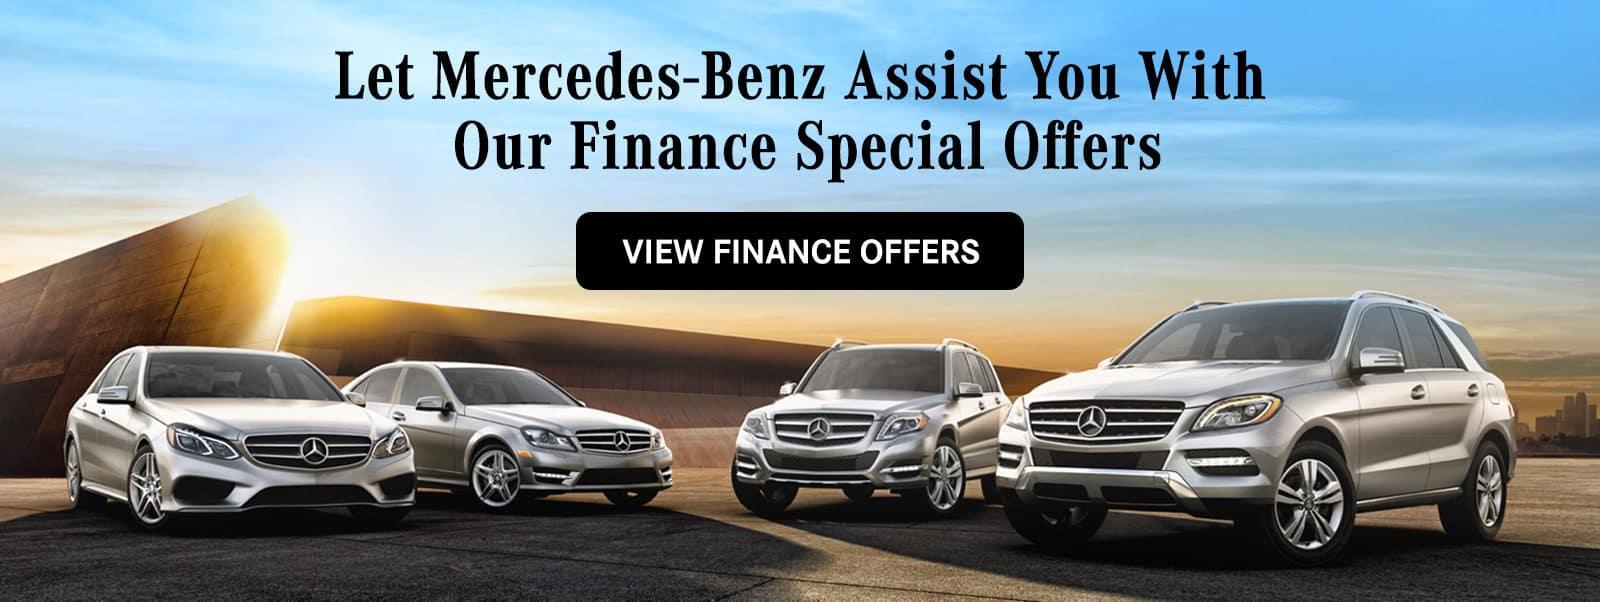 Mercedes benz of omaha ne new mercedes benz sales service for Mercedes benz finance customer service